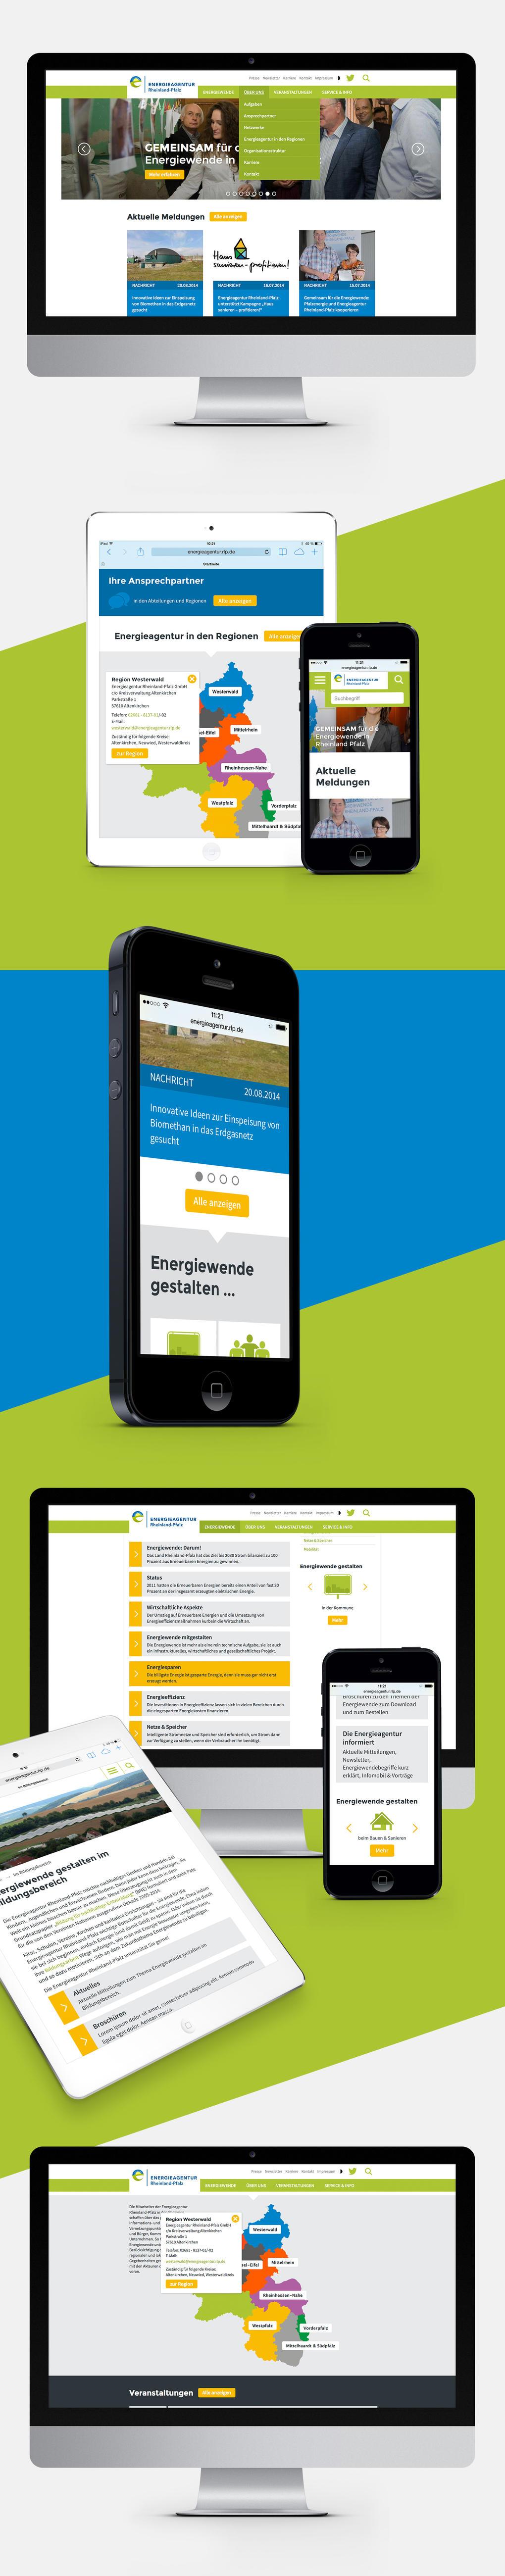 Energieagentur_Projektbild